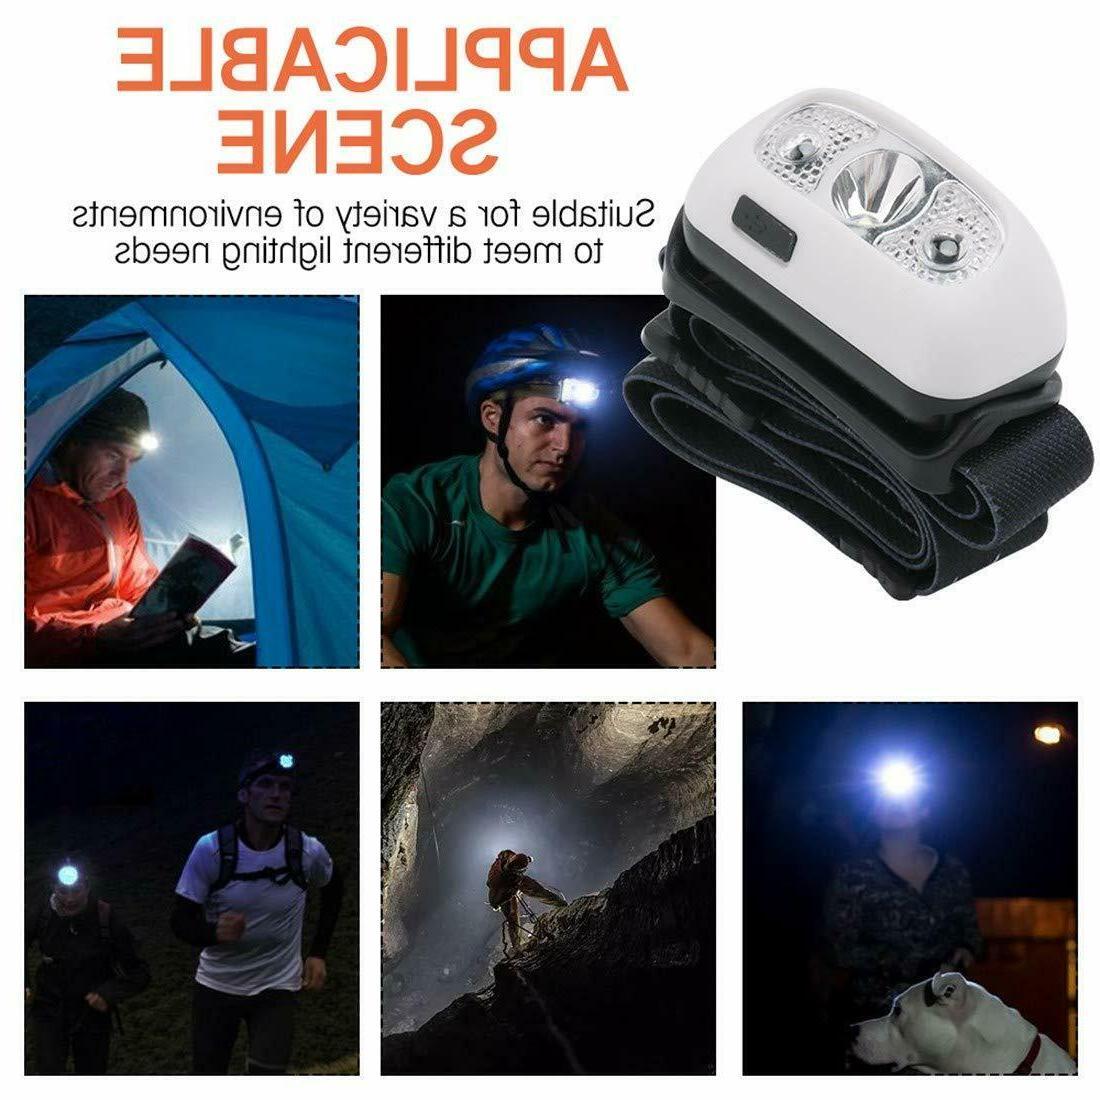 Waterproof USB Headlight Headlamp Torch Flashlight